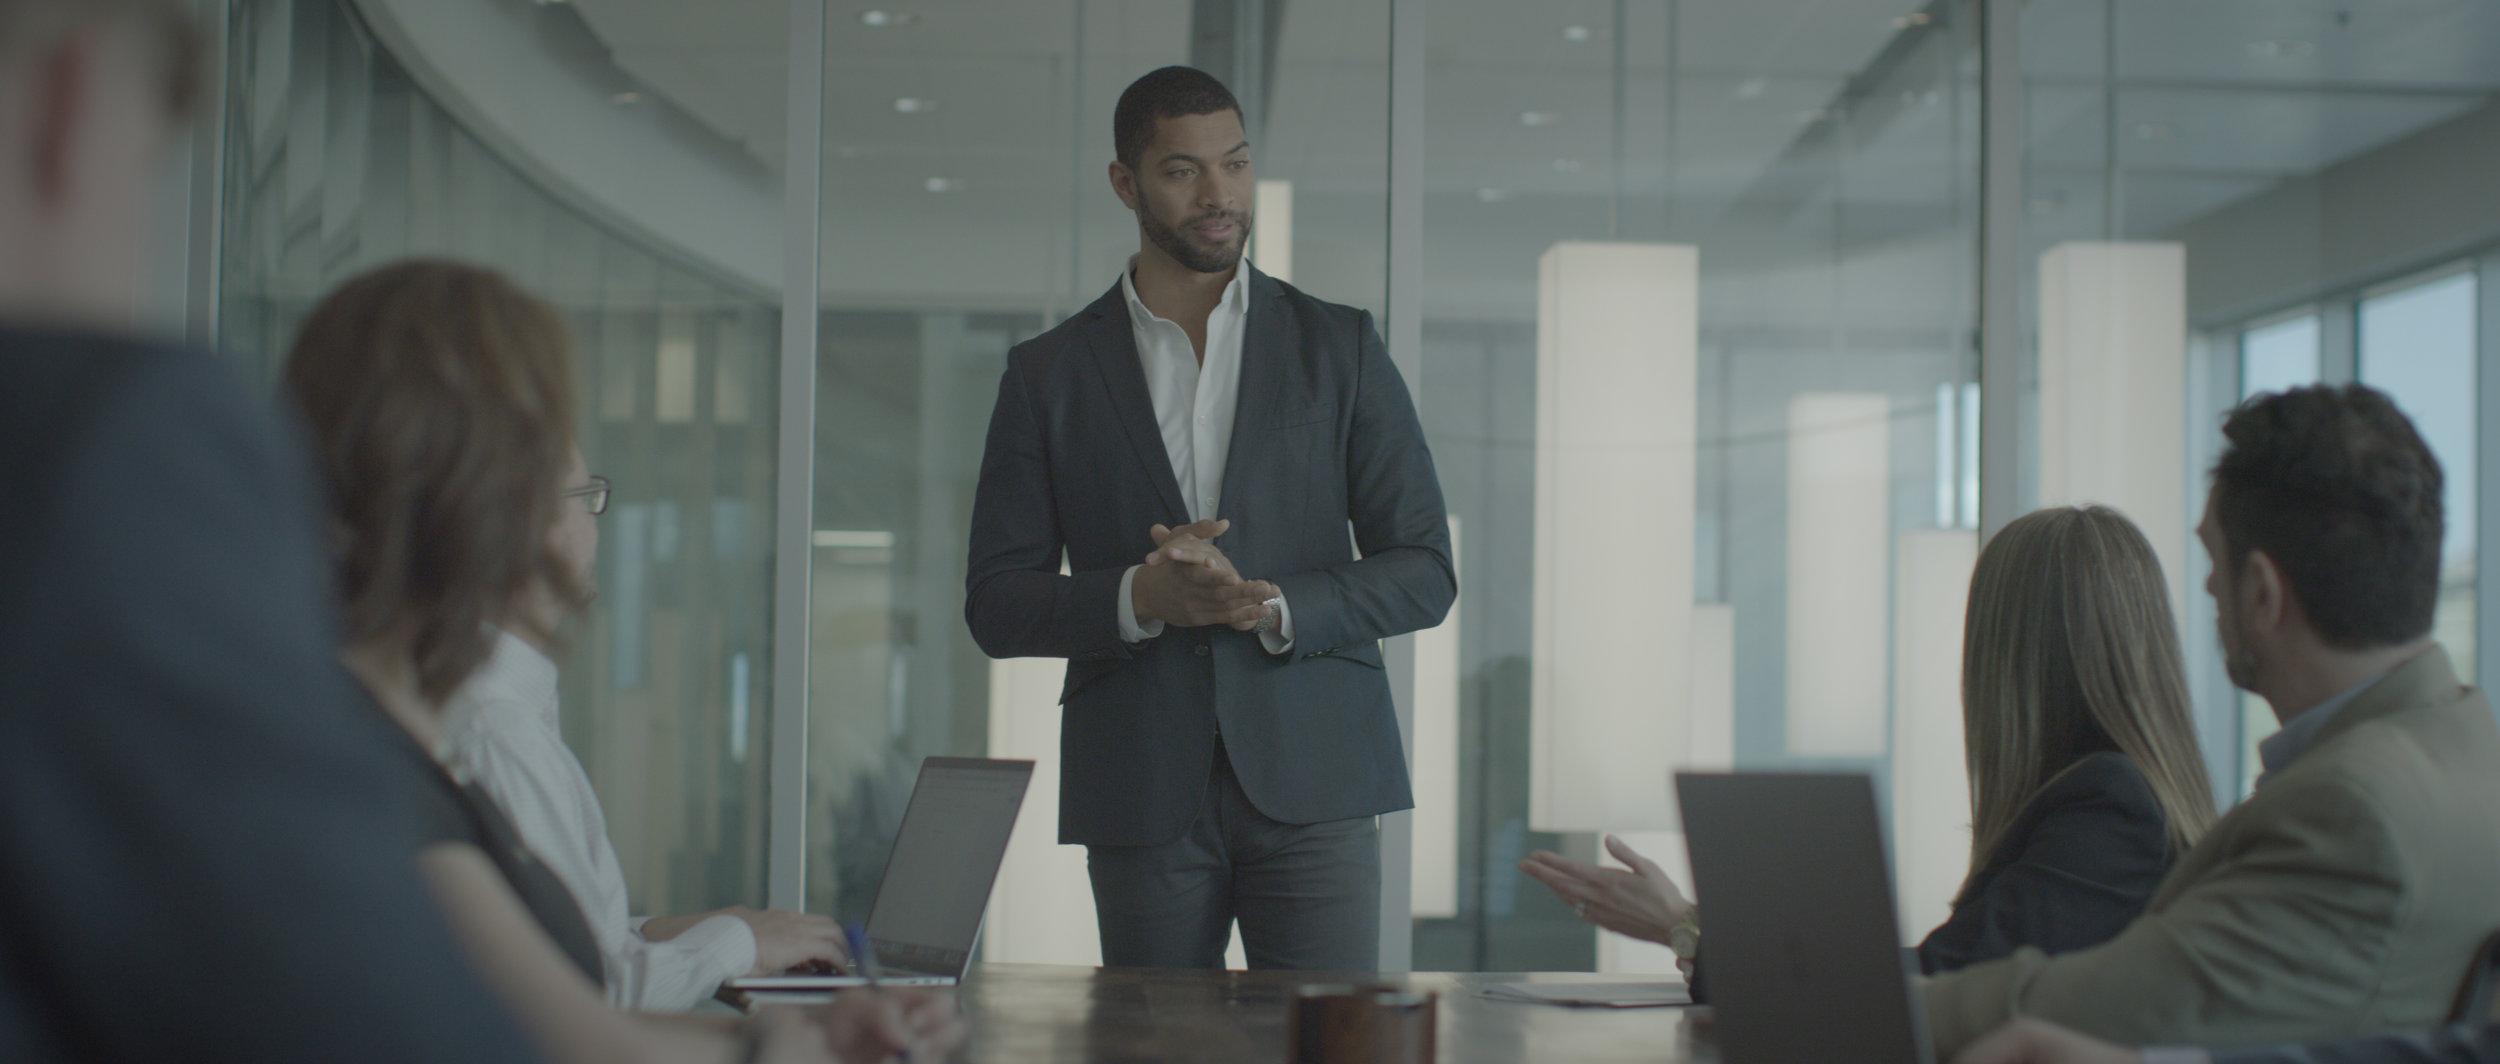 Businessman Flat.jpg